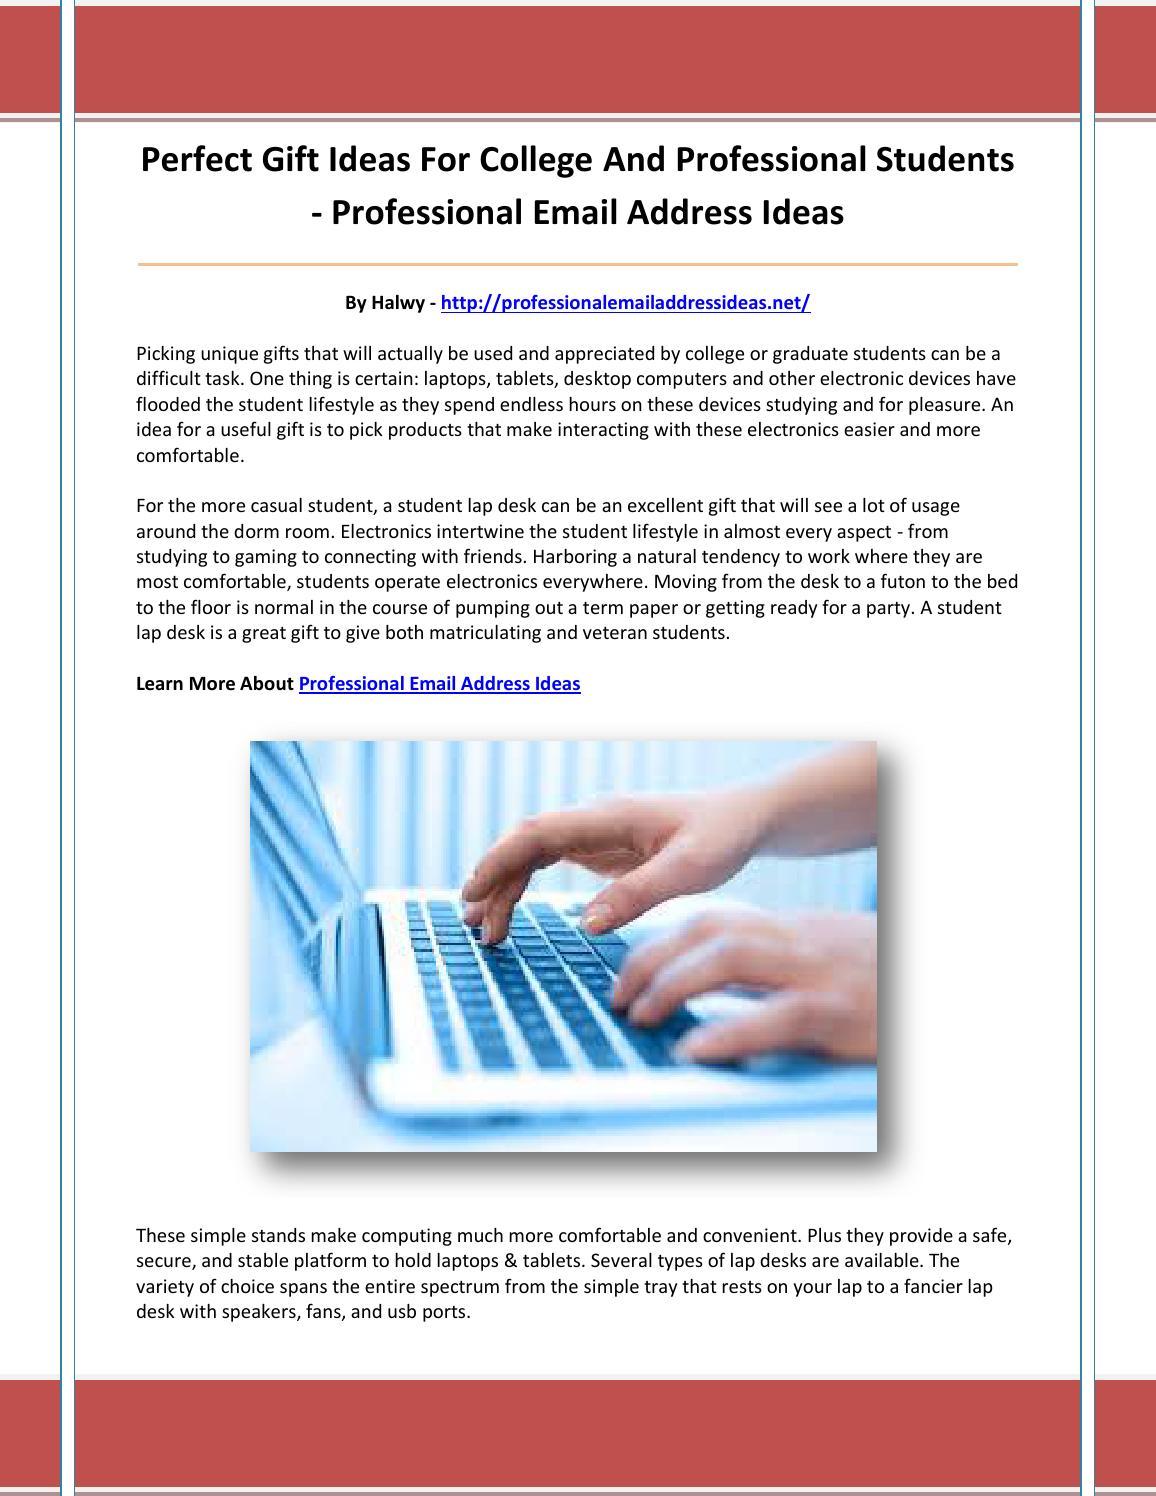 professional email address ideas by kmnbhgvtn - issuu